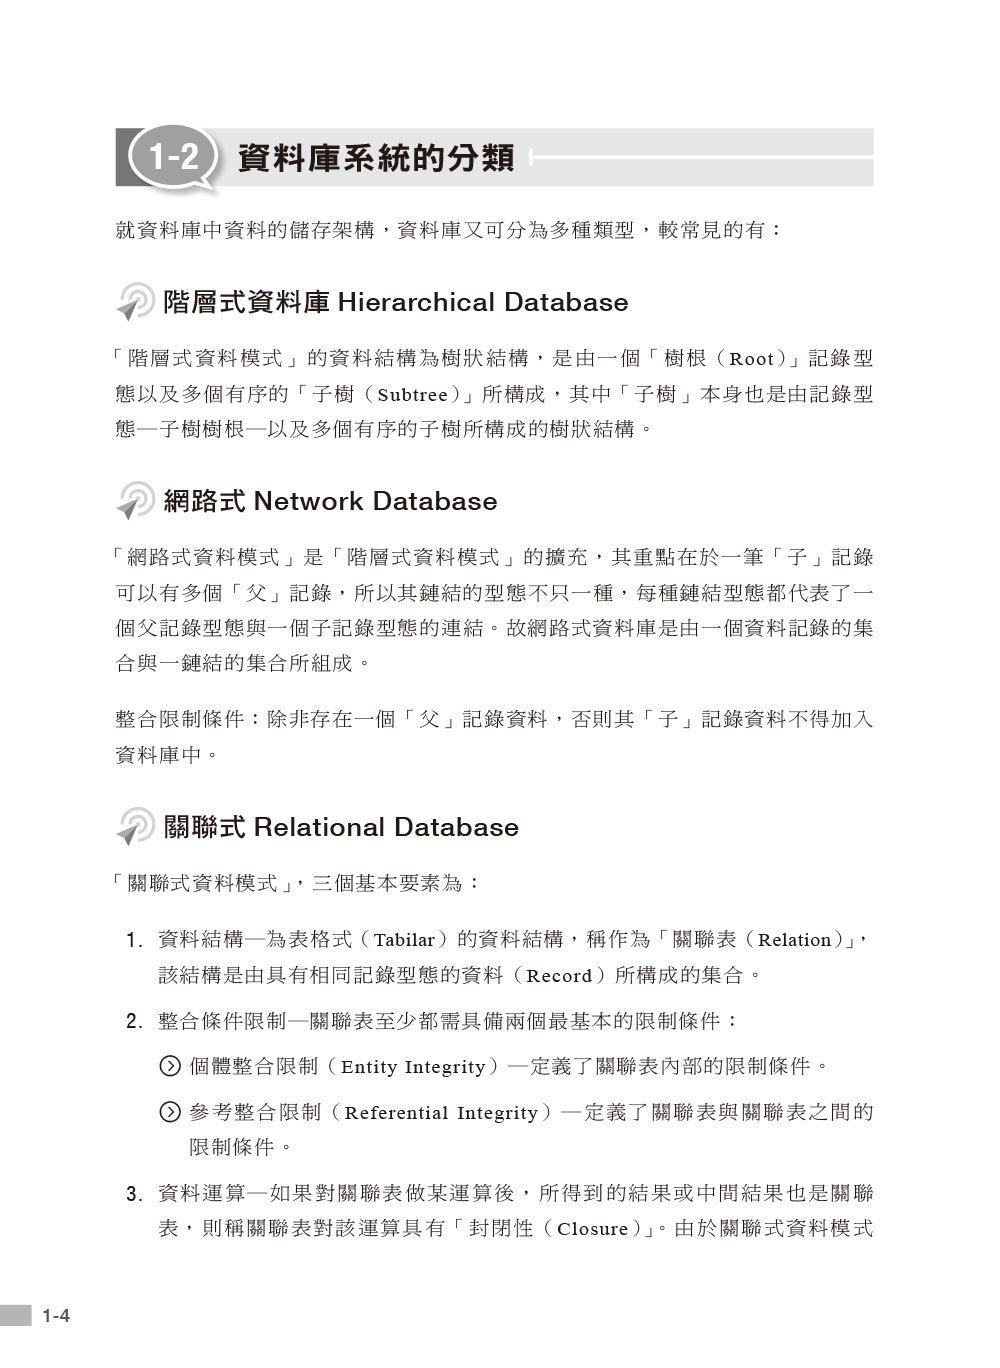 MTA Database Fundamentals 資料庫管理 國際認證教戰手冊 (98-364)-preview-4